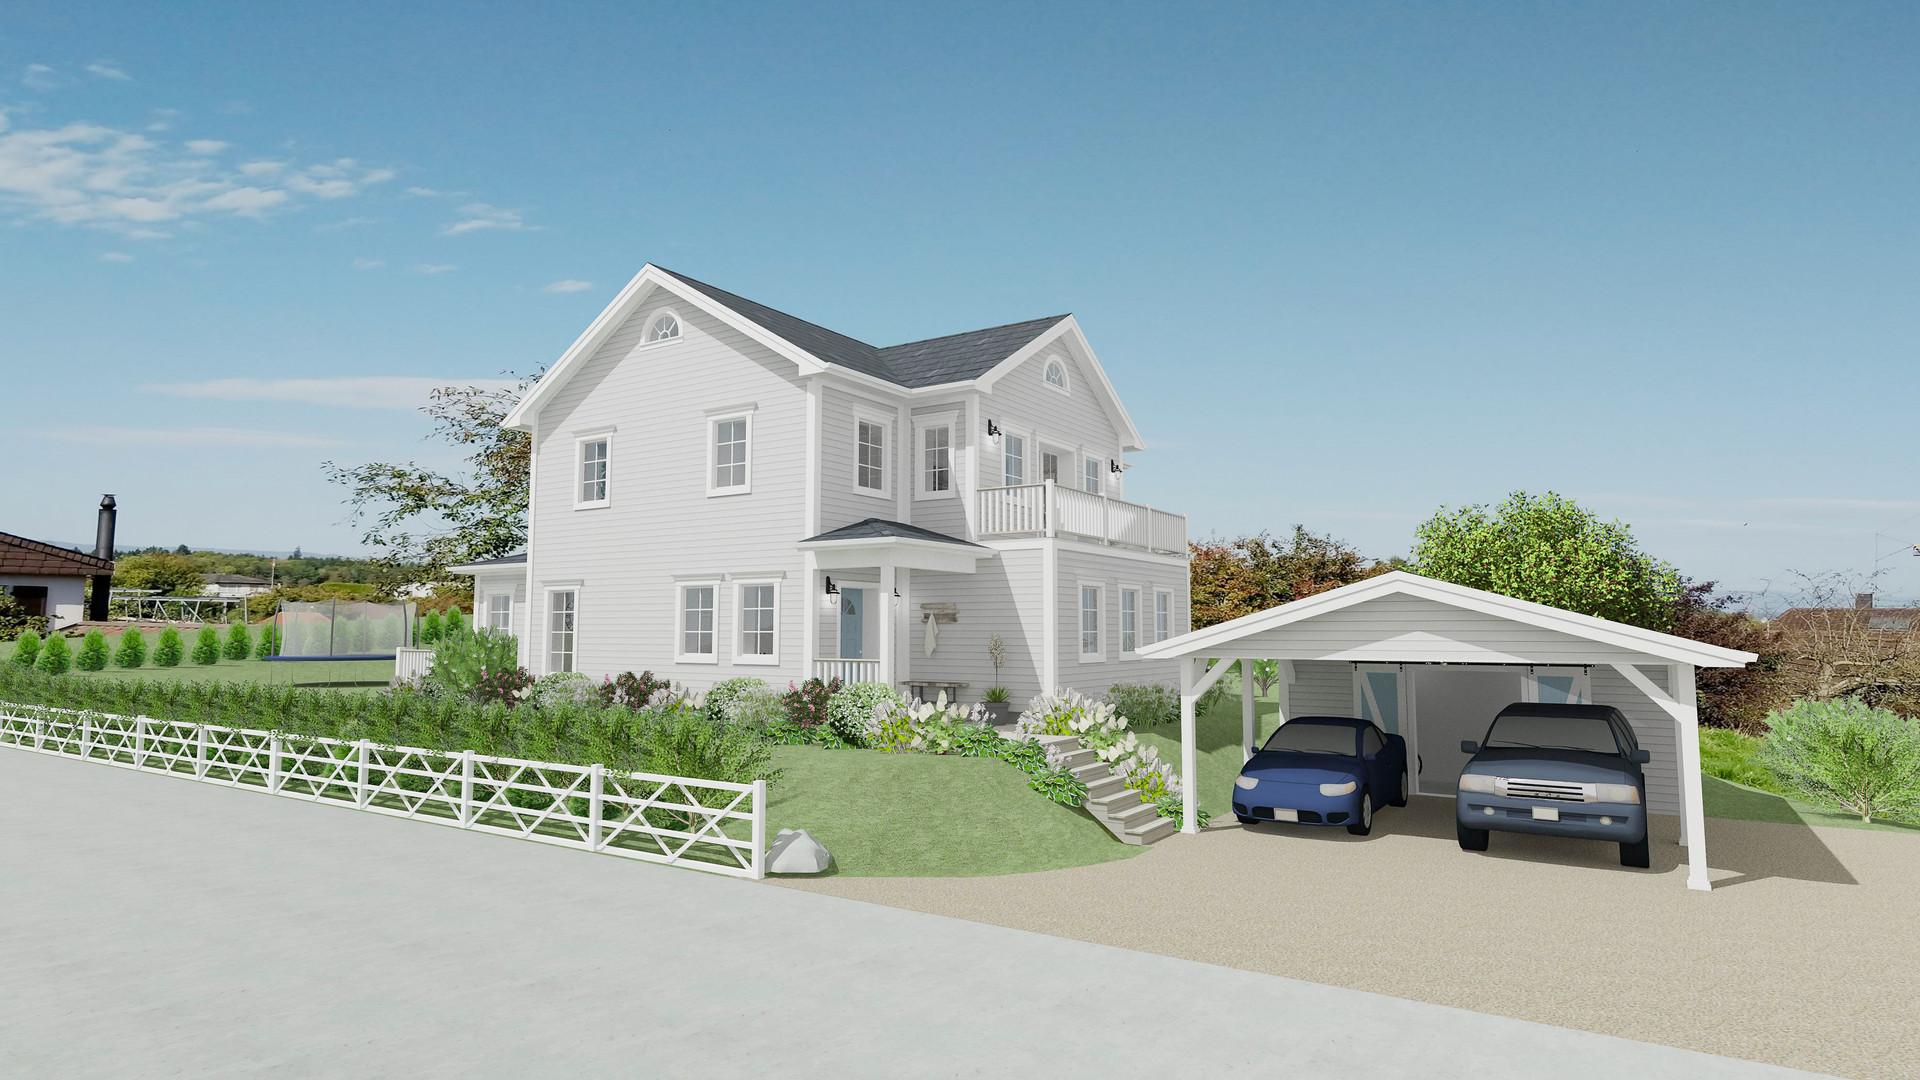 New England Haus, Nordost